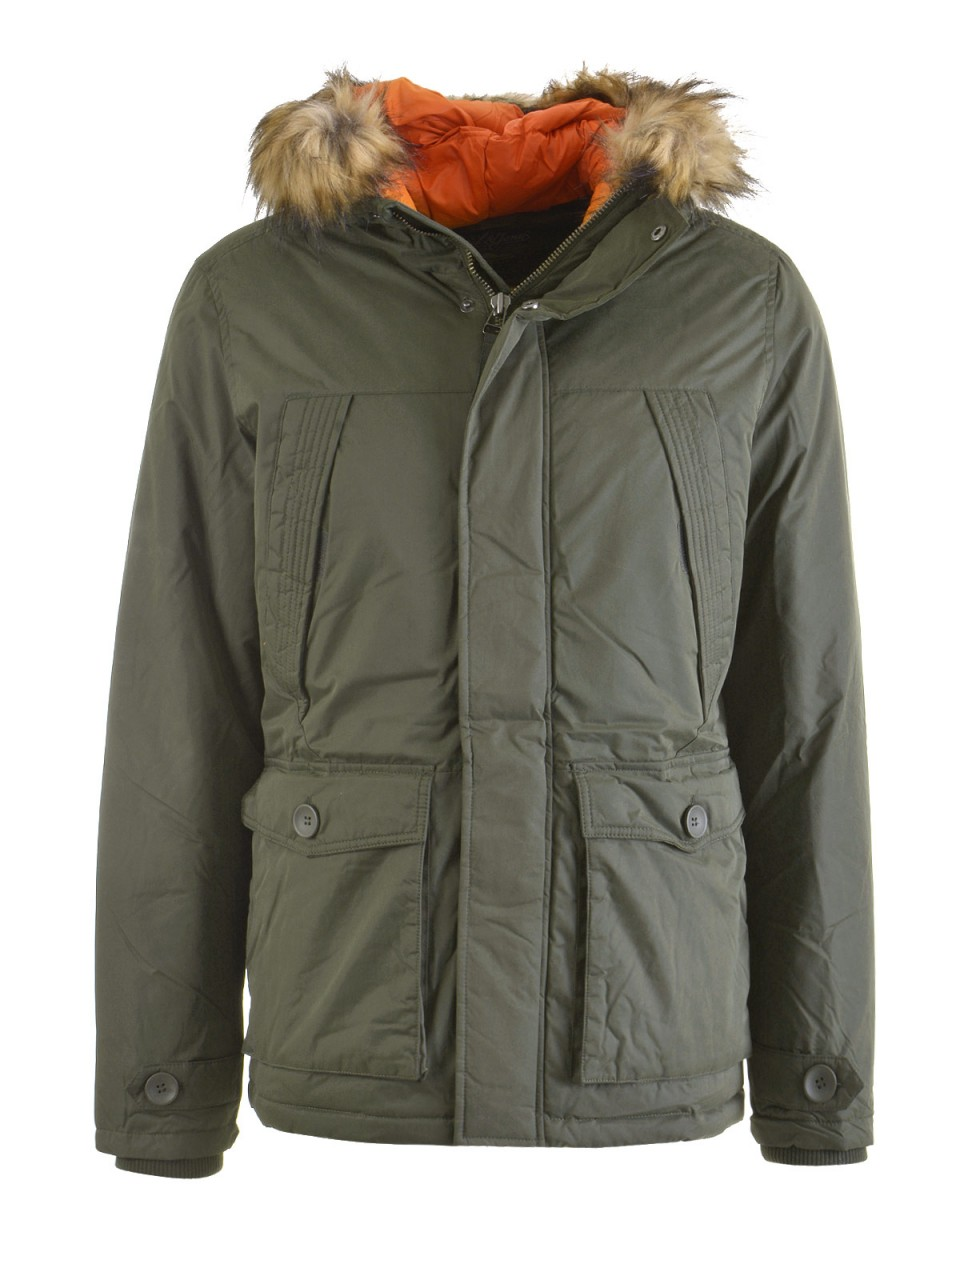 jack-amp-jones-herren-jacke-mountain-parka-oliv, 89.99 EUR @ designermode-com-mode